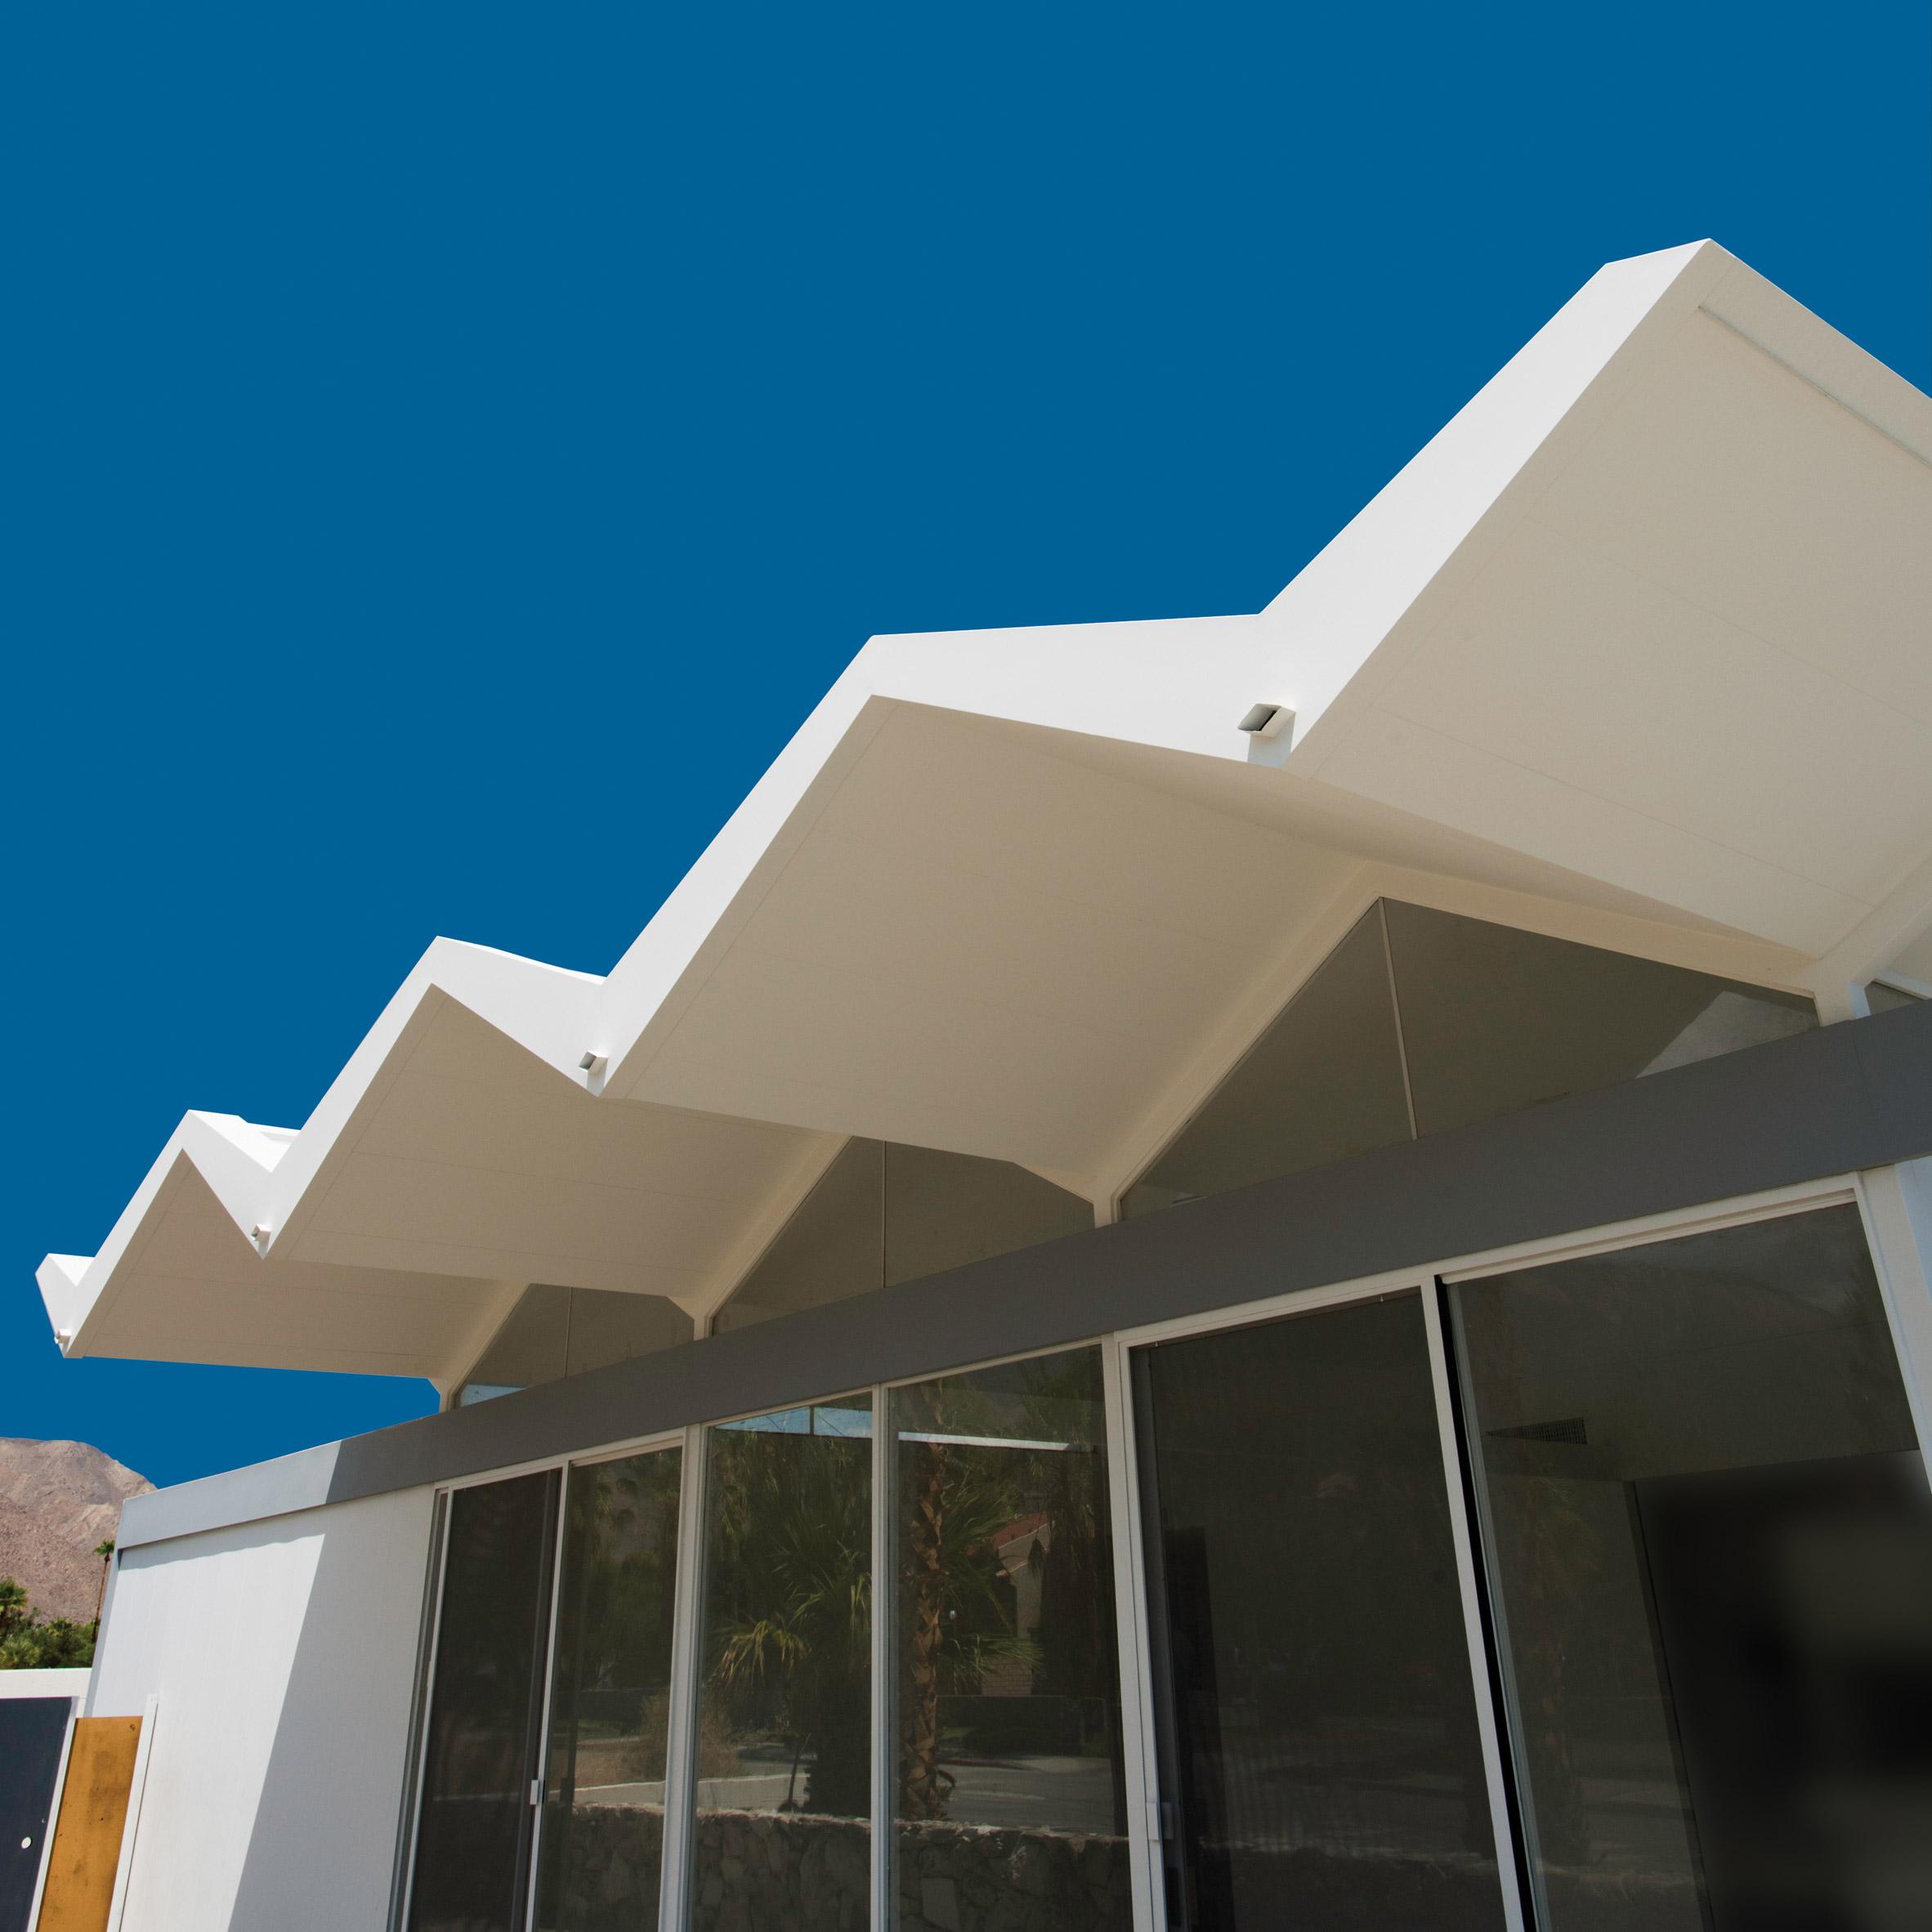 Steel Development Houses by Donald Wexler